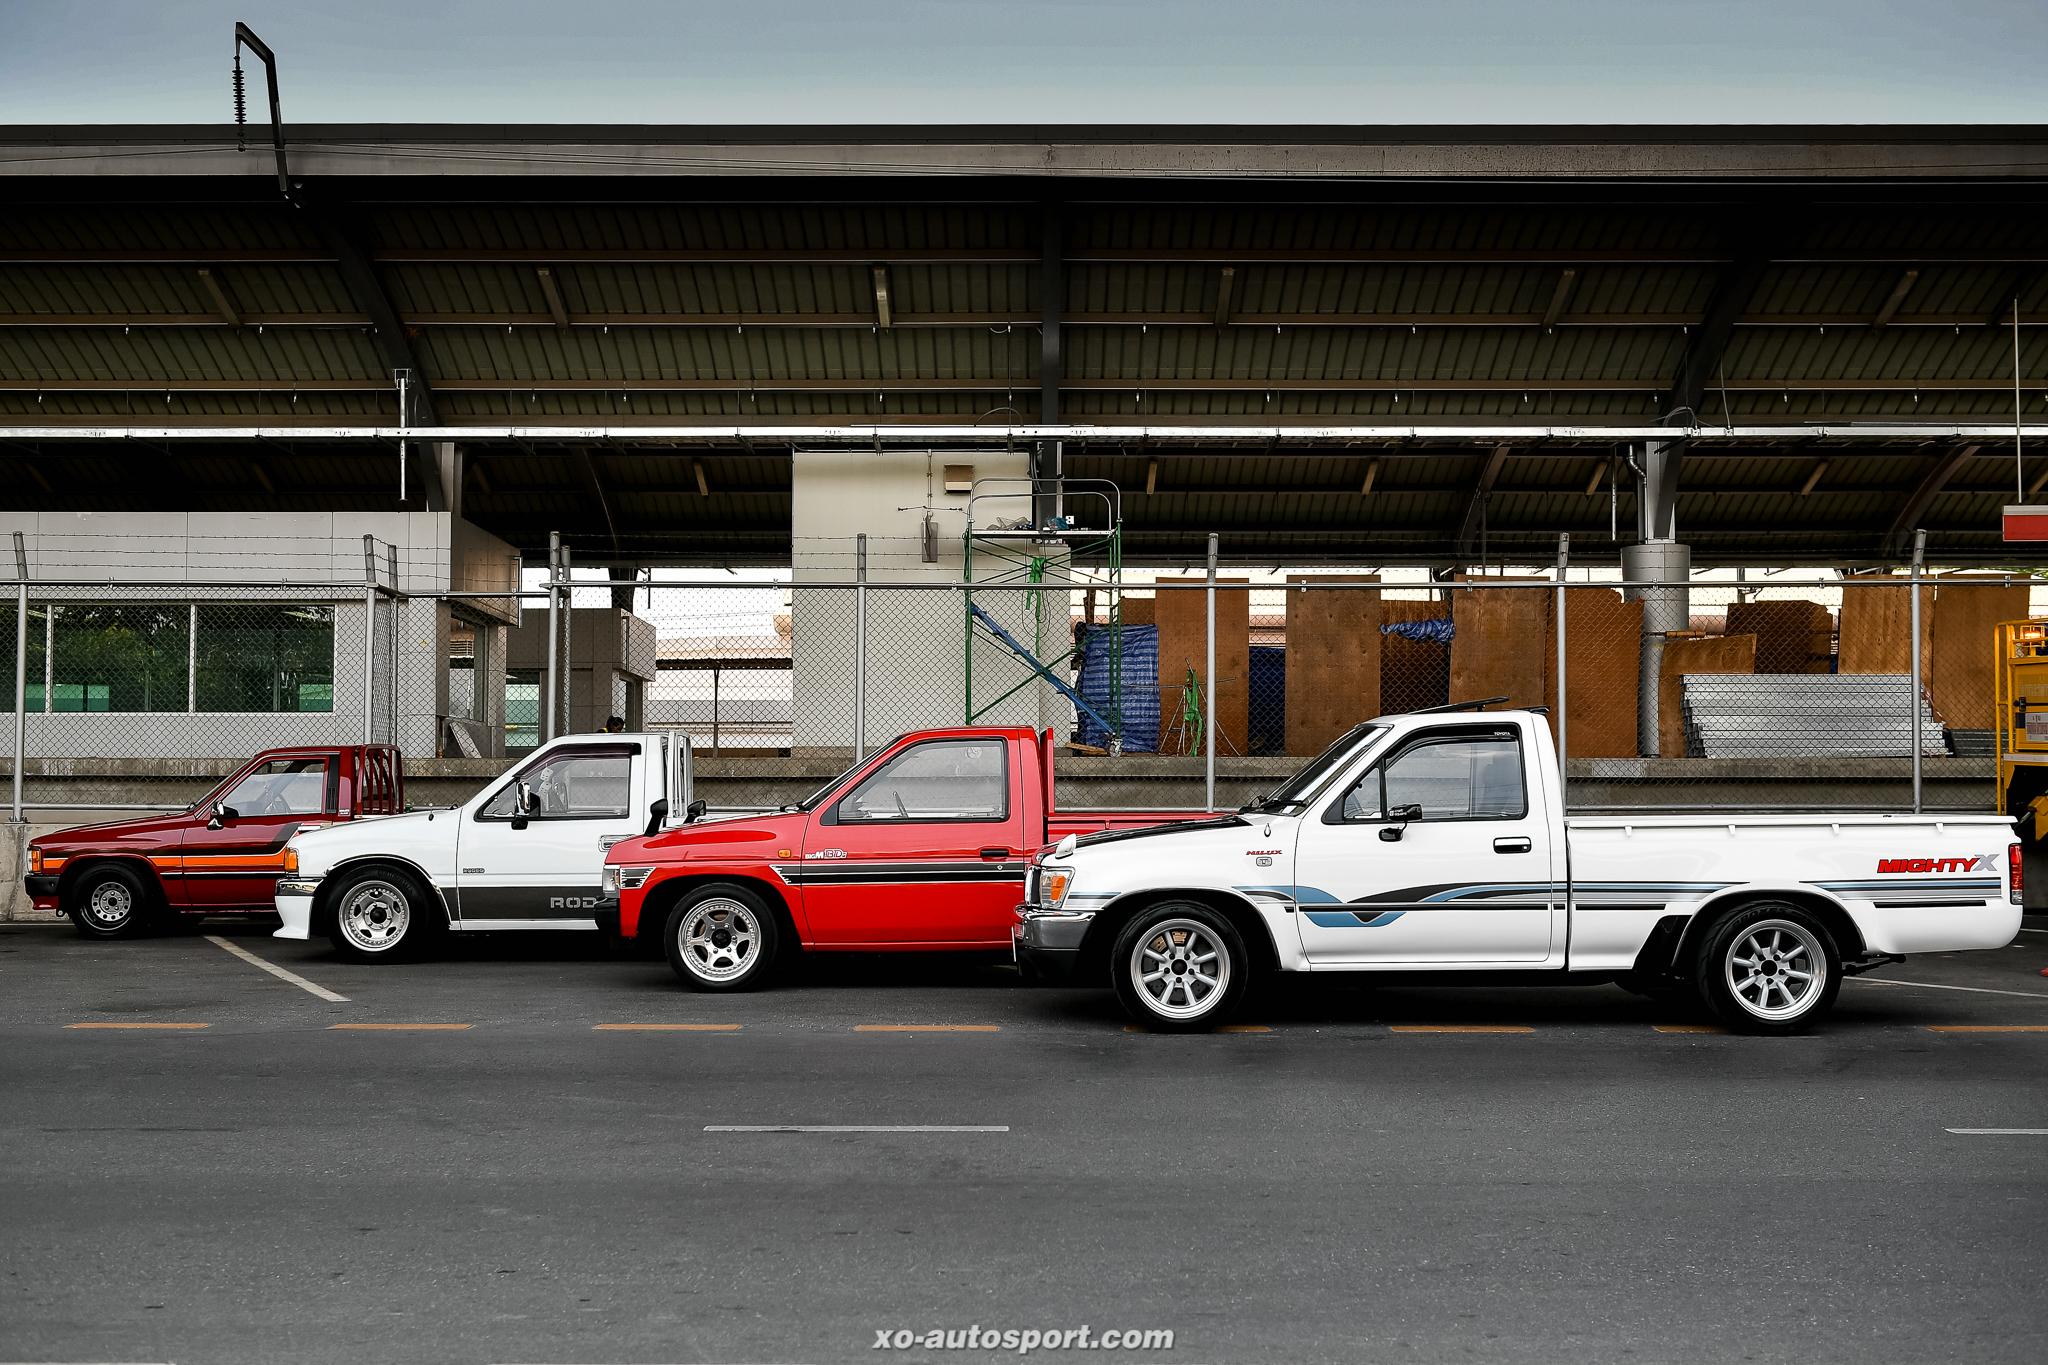 Short base truck 01 Open pic